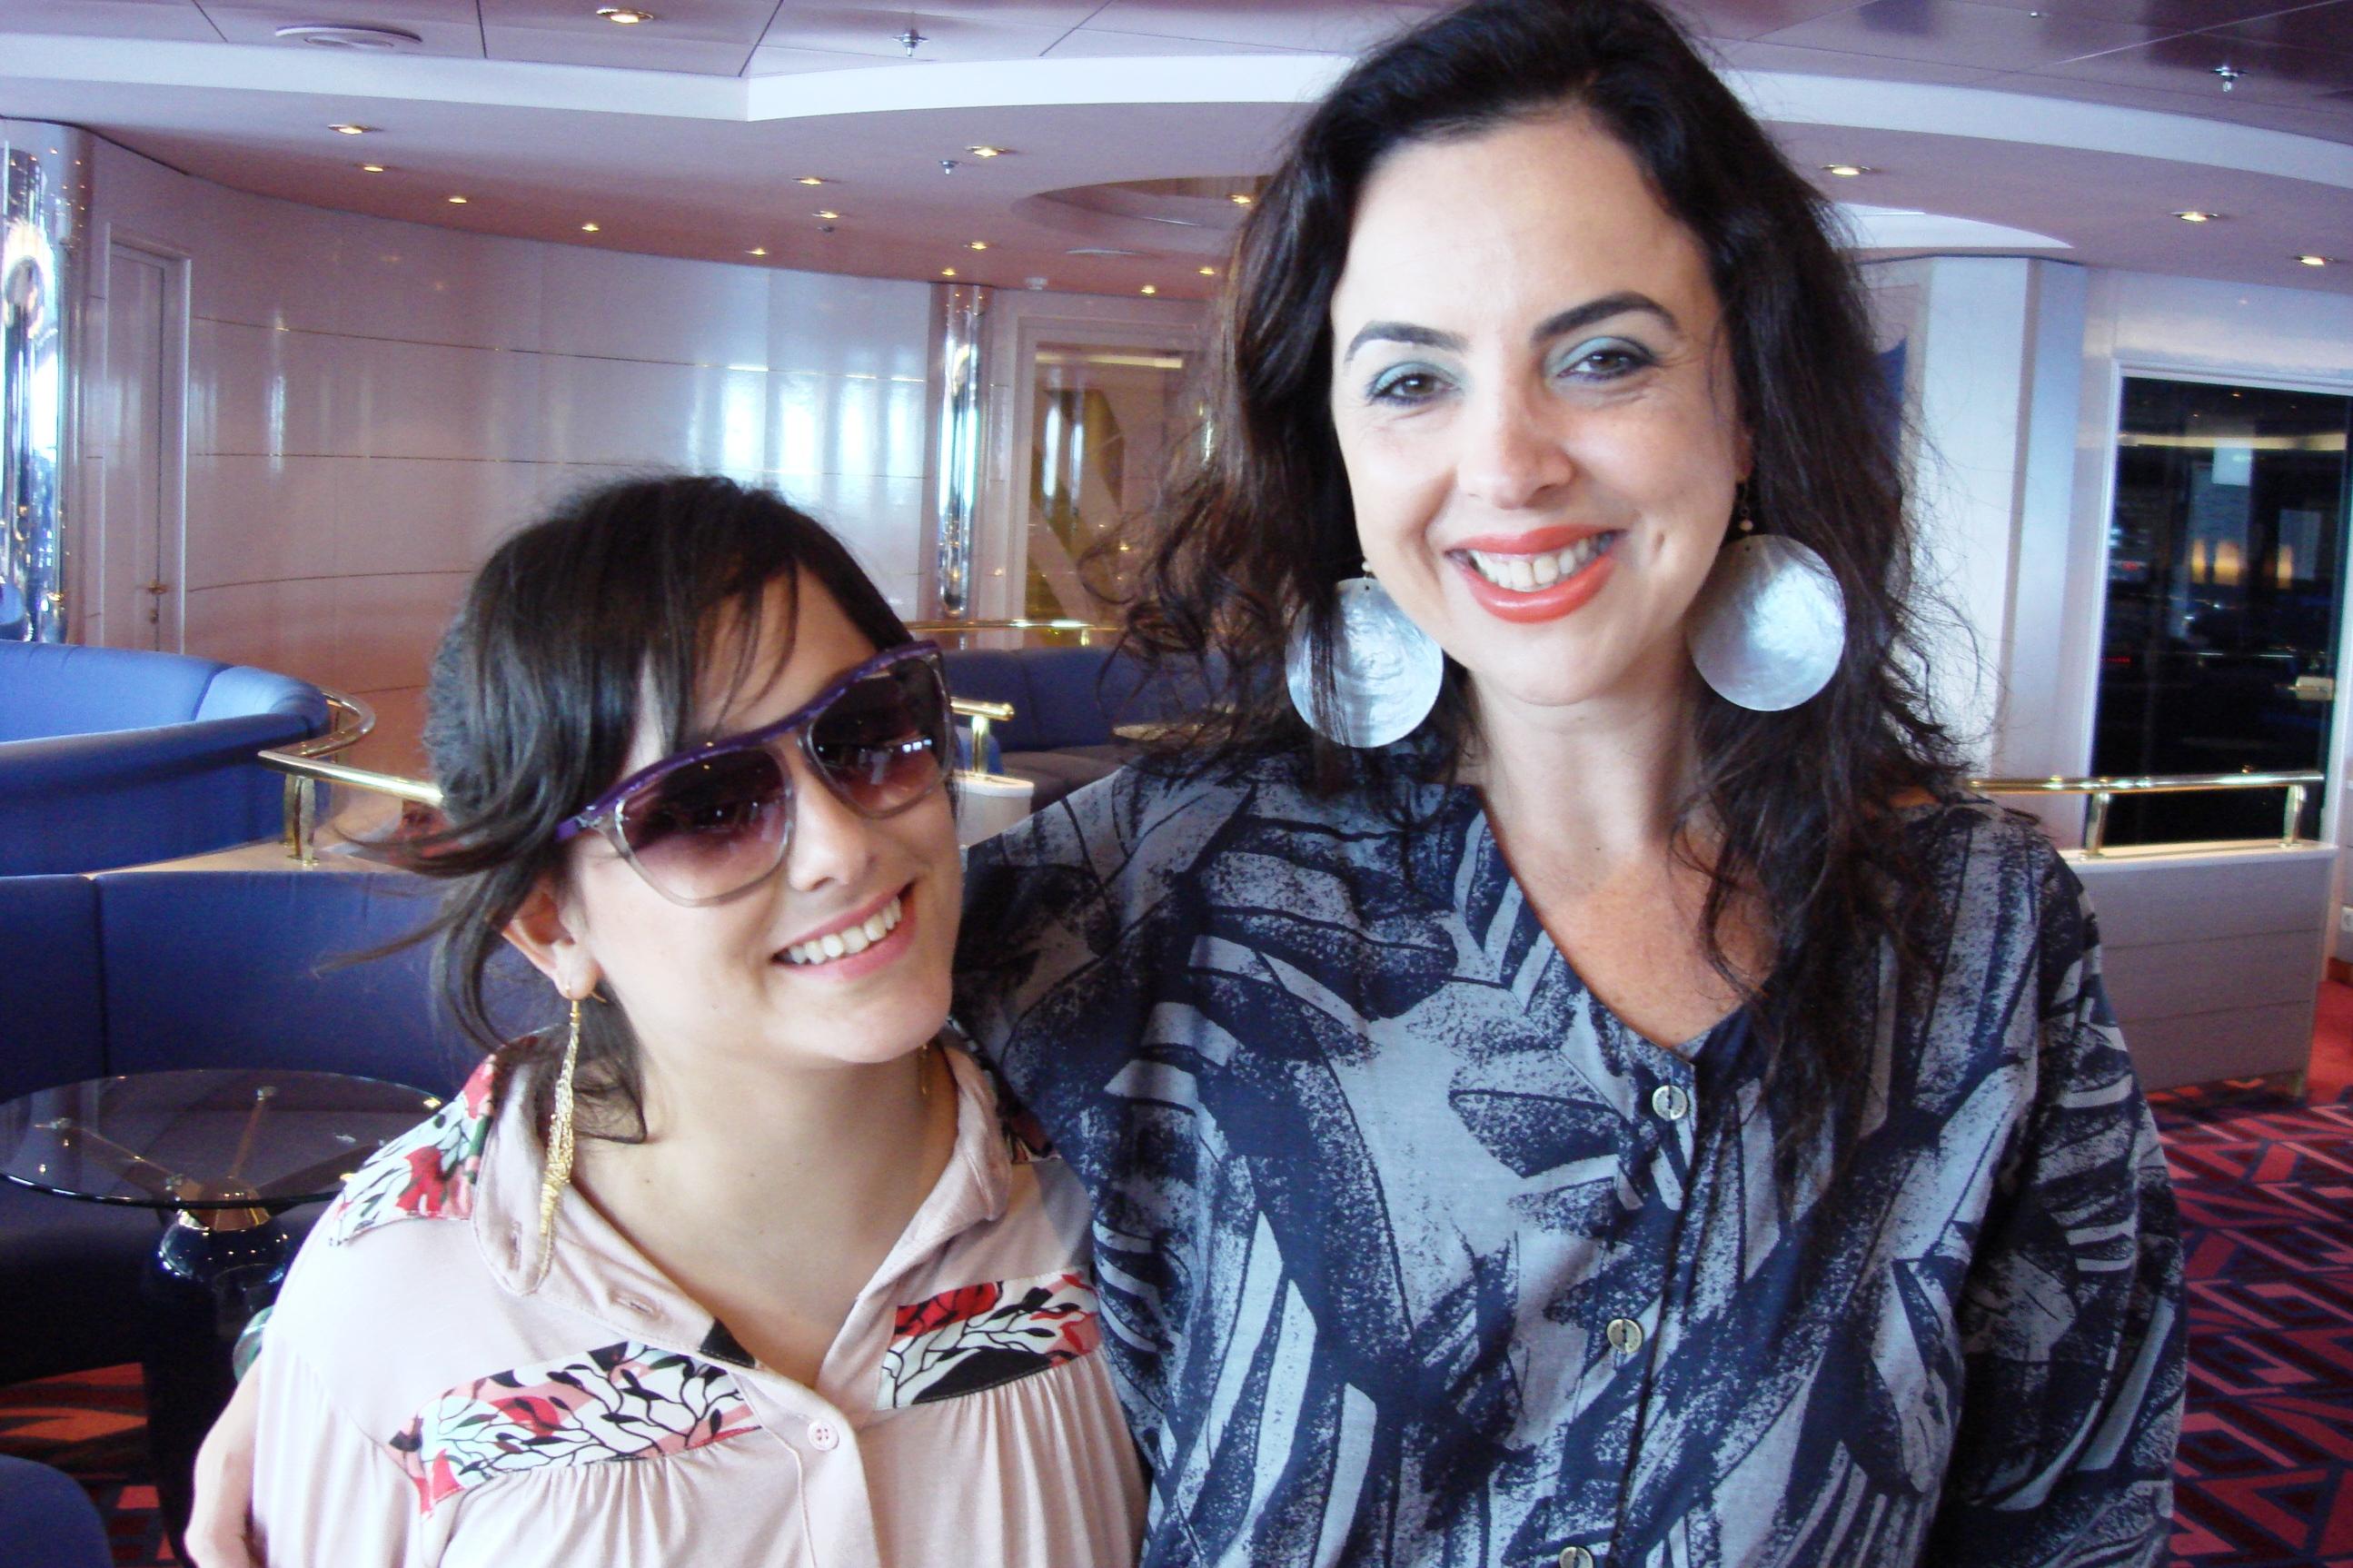 Entrevista com a estilista Karin Felller 61268b793cb08